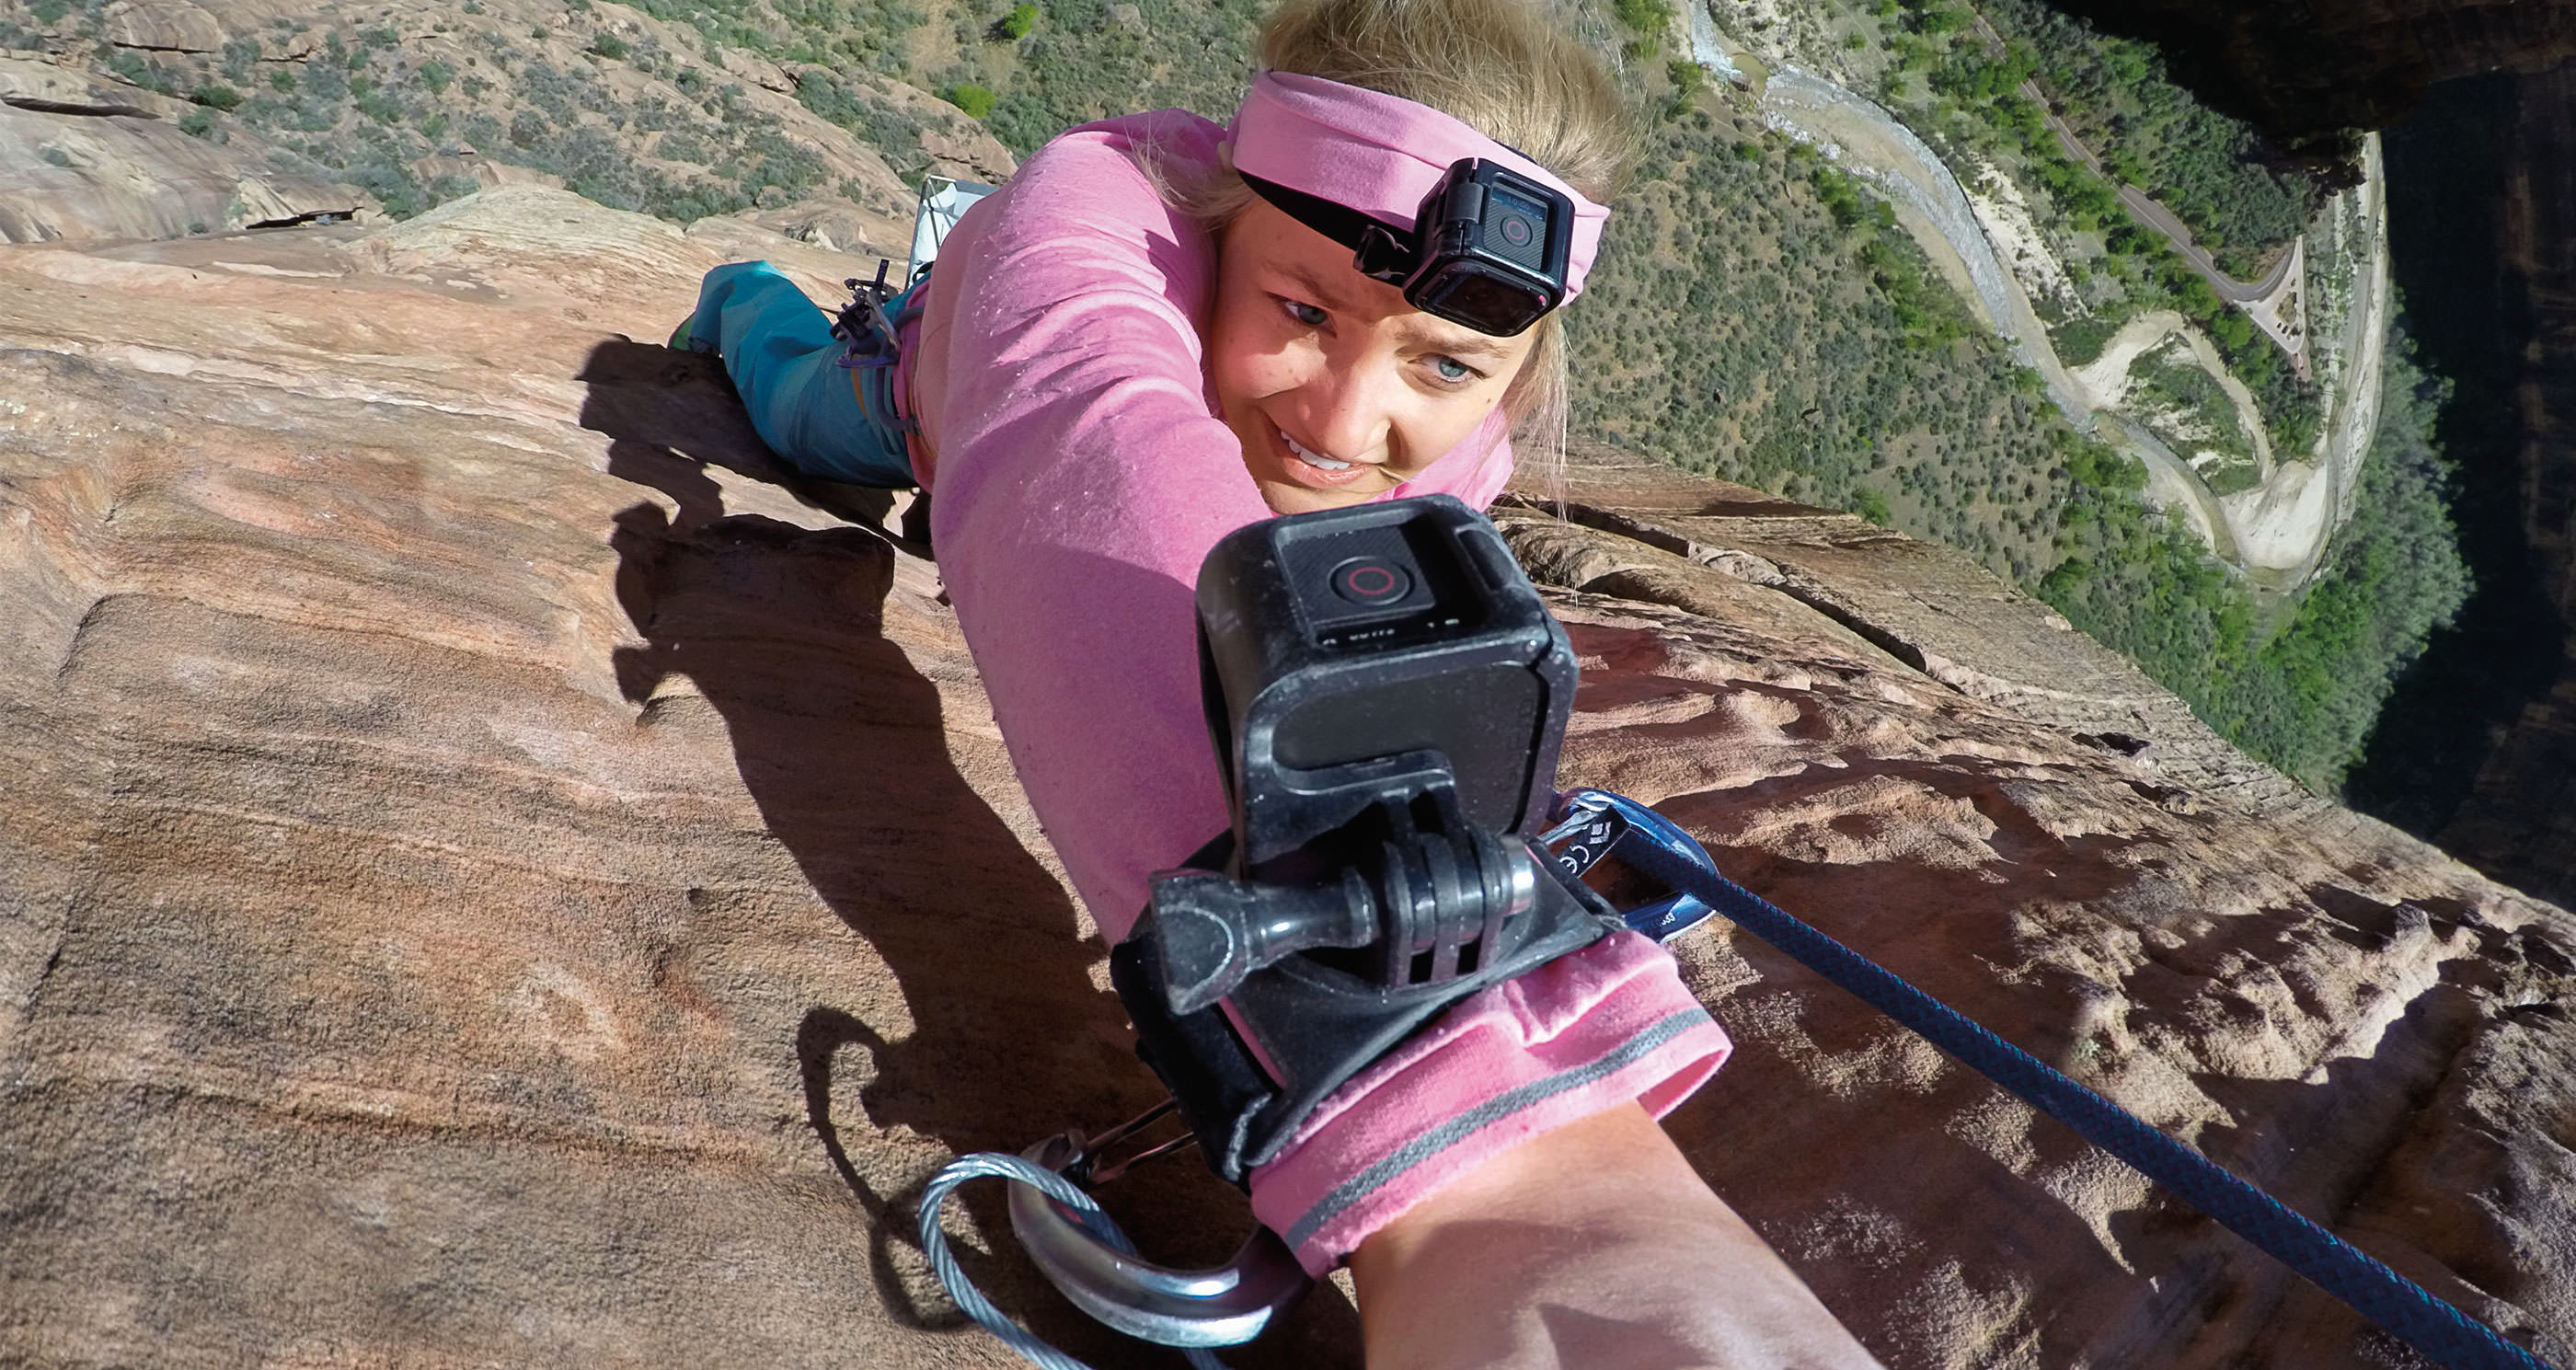 GoPro The Strap (AHWBM-001) - Крепление на руку для камер GoPro